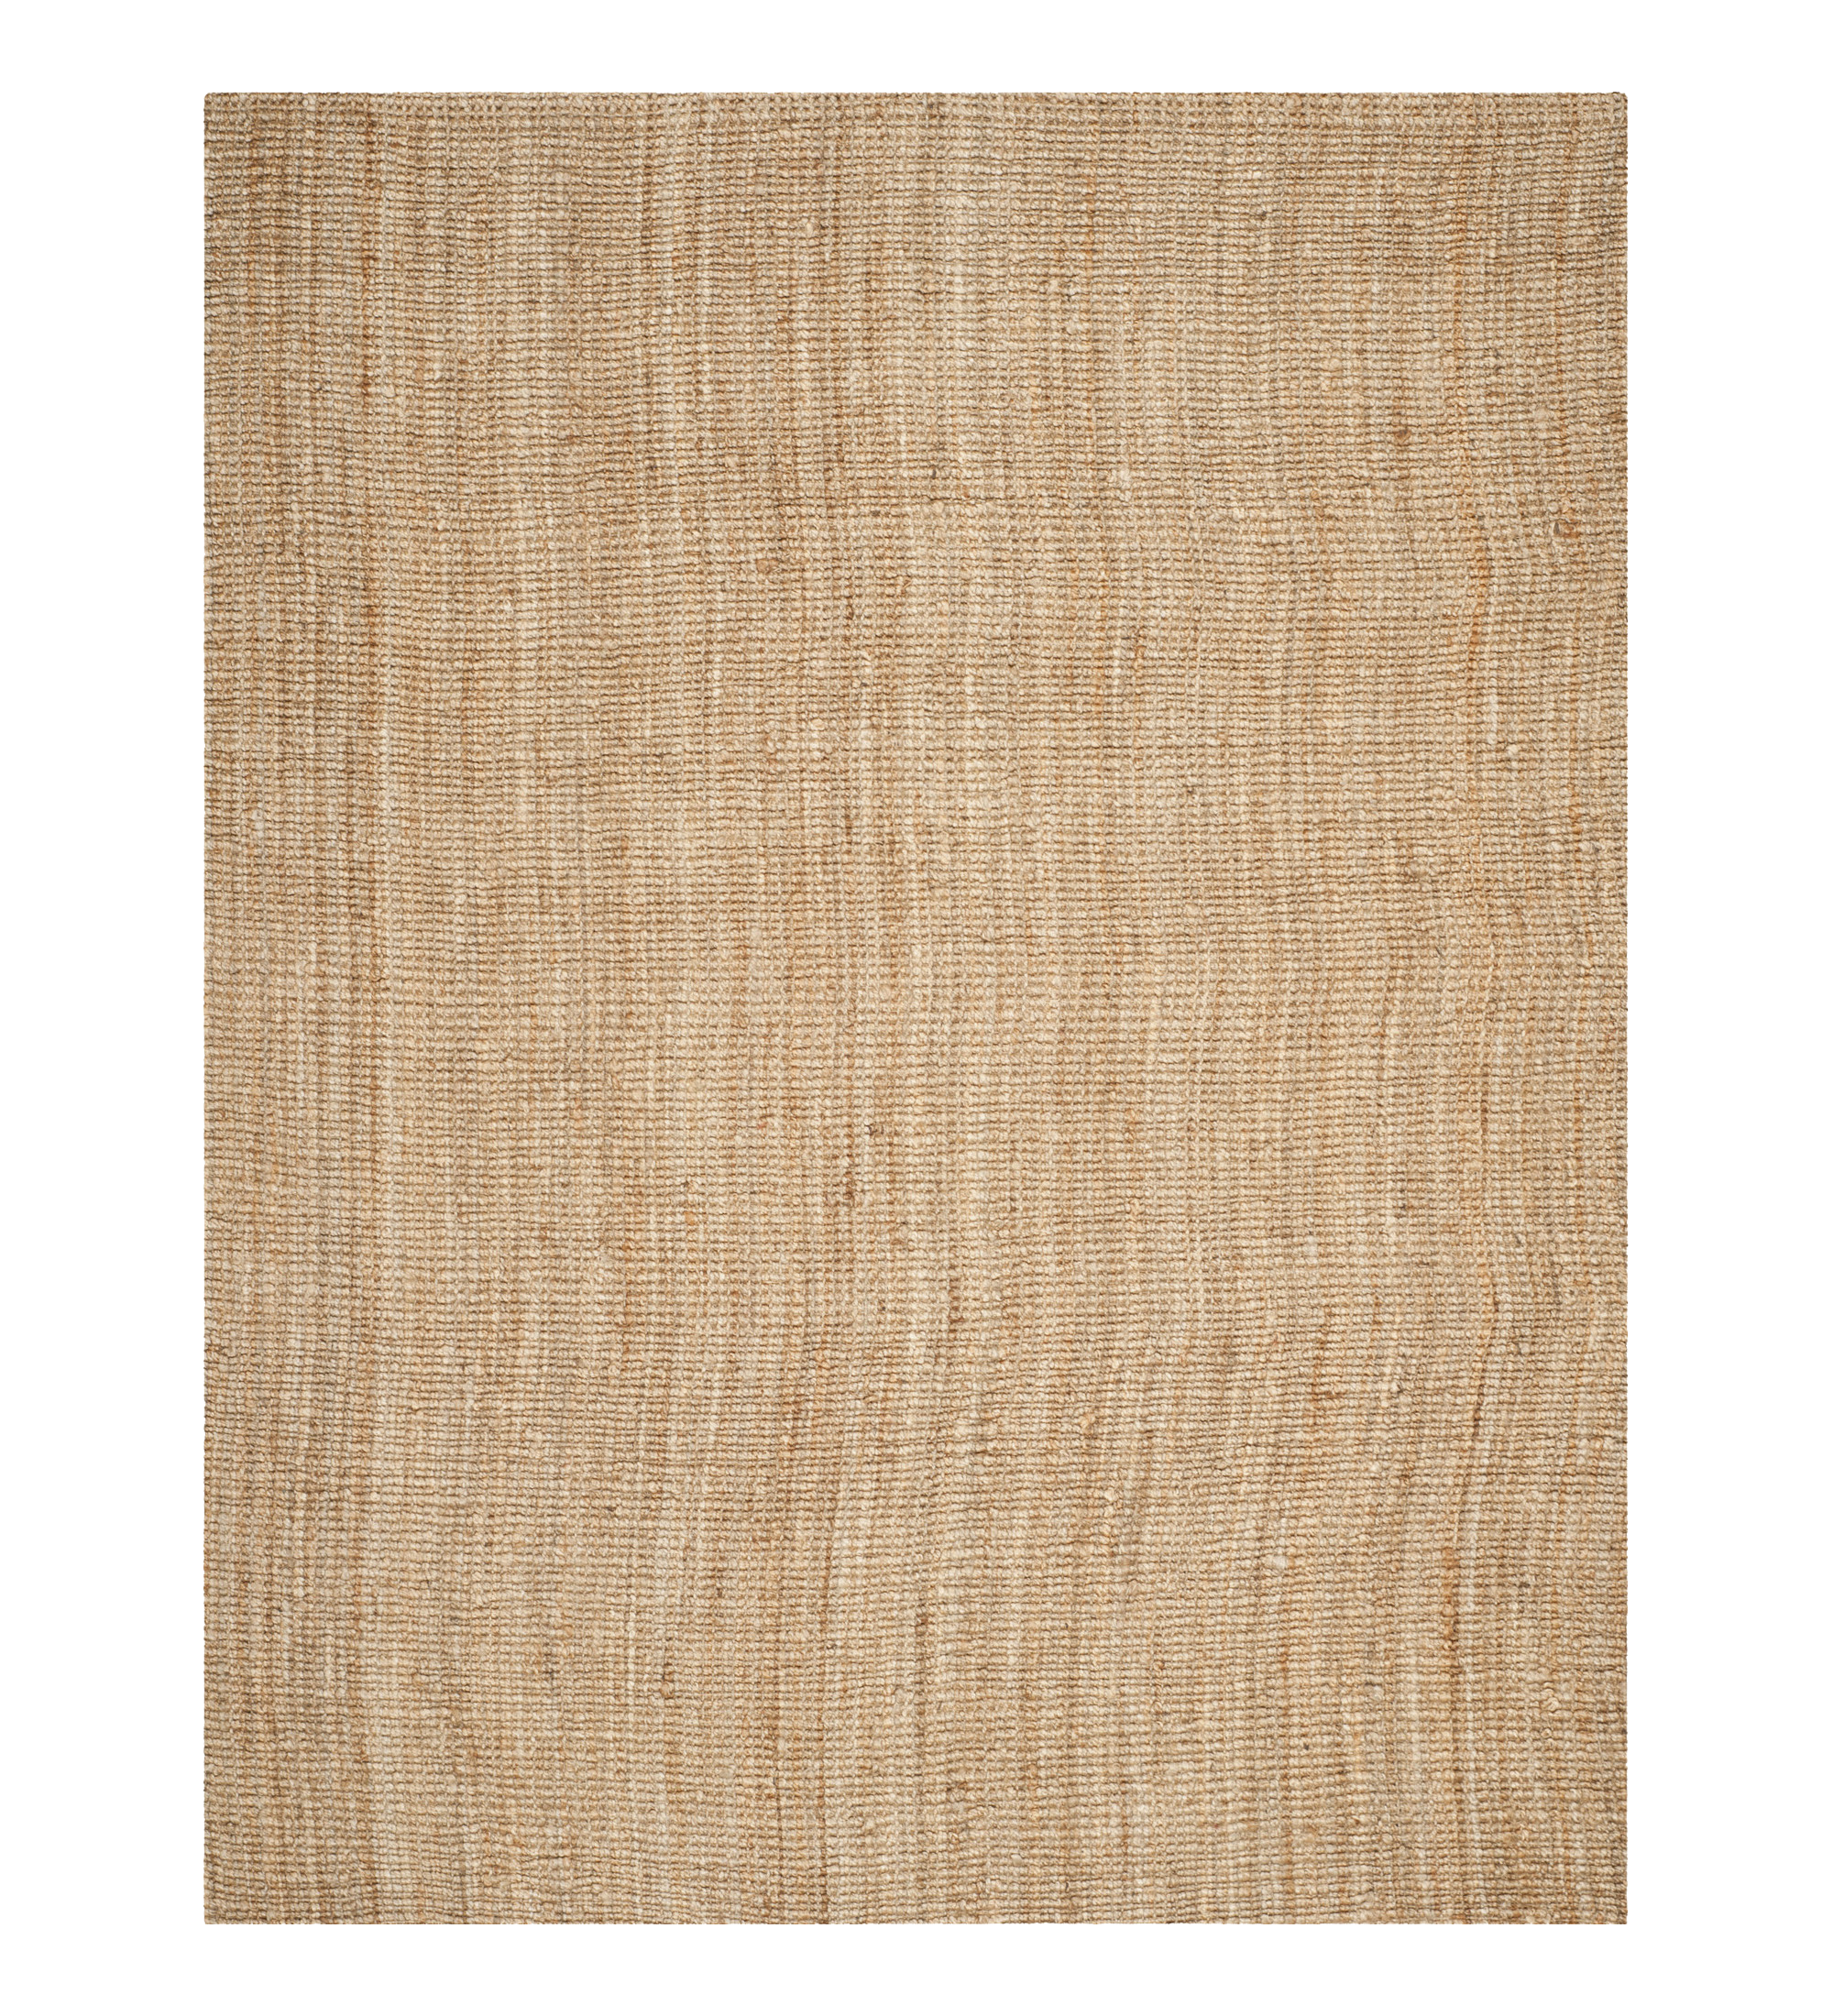 Natural basket weave jute rug : 9x12' : $370